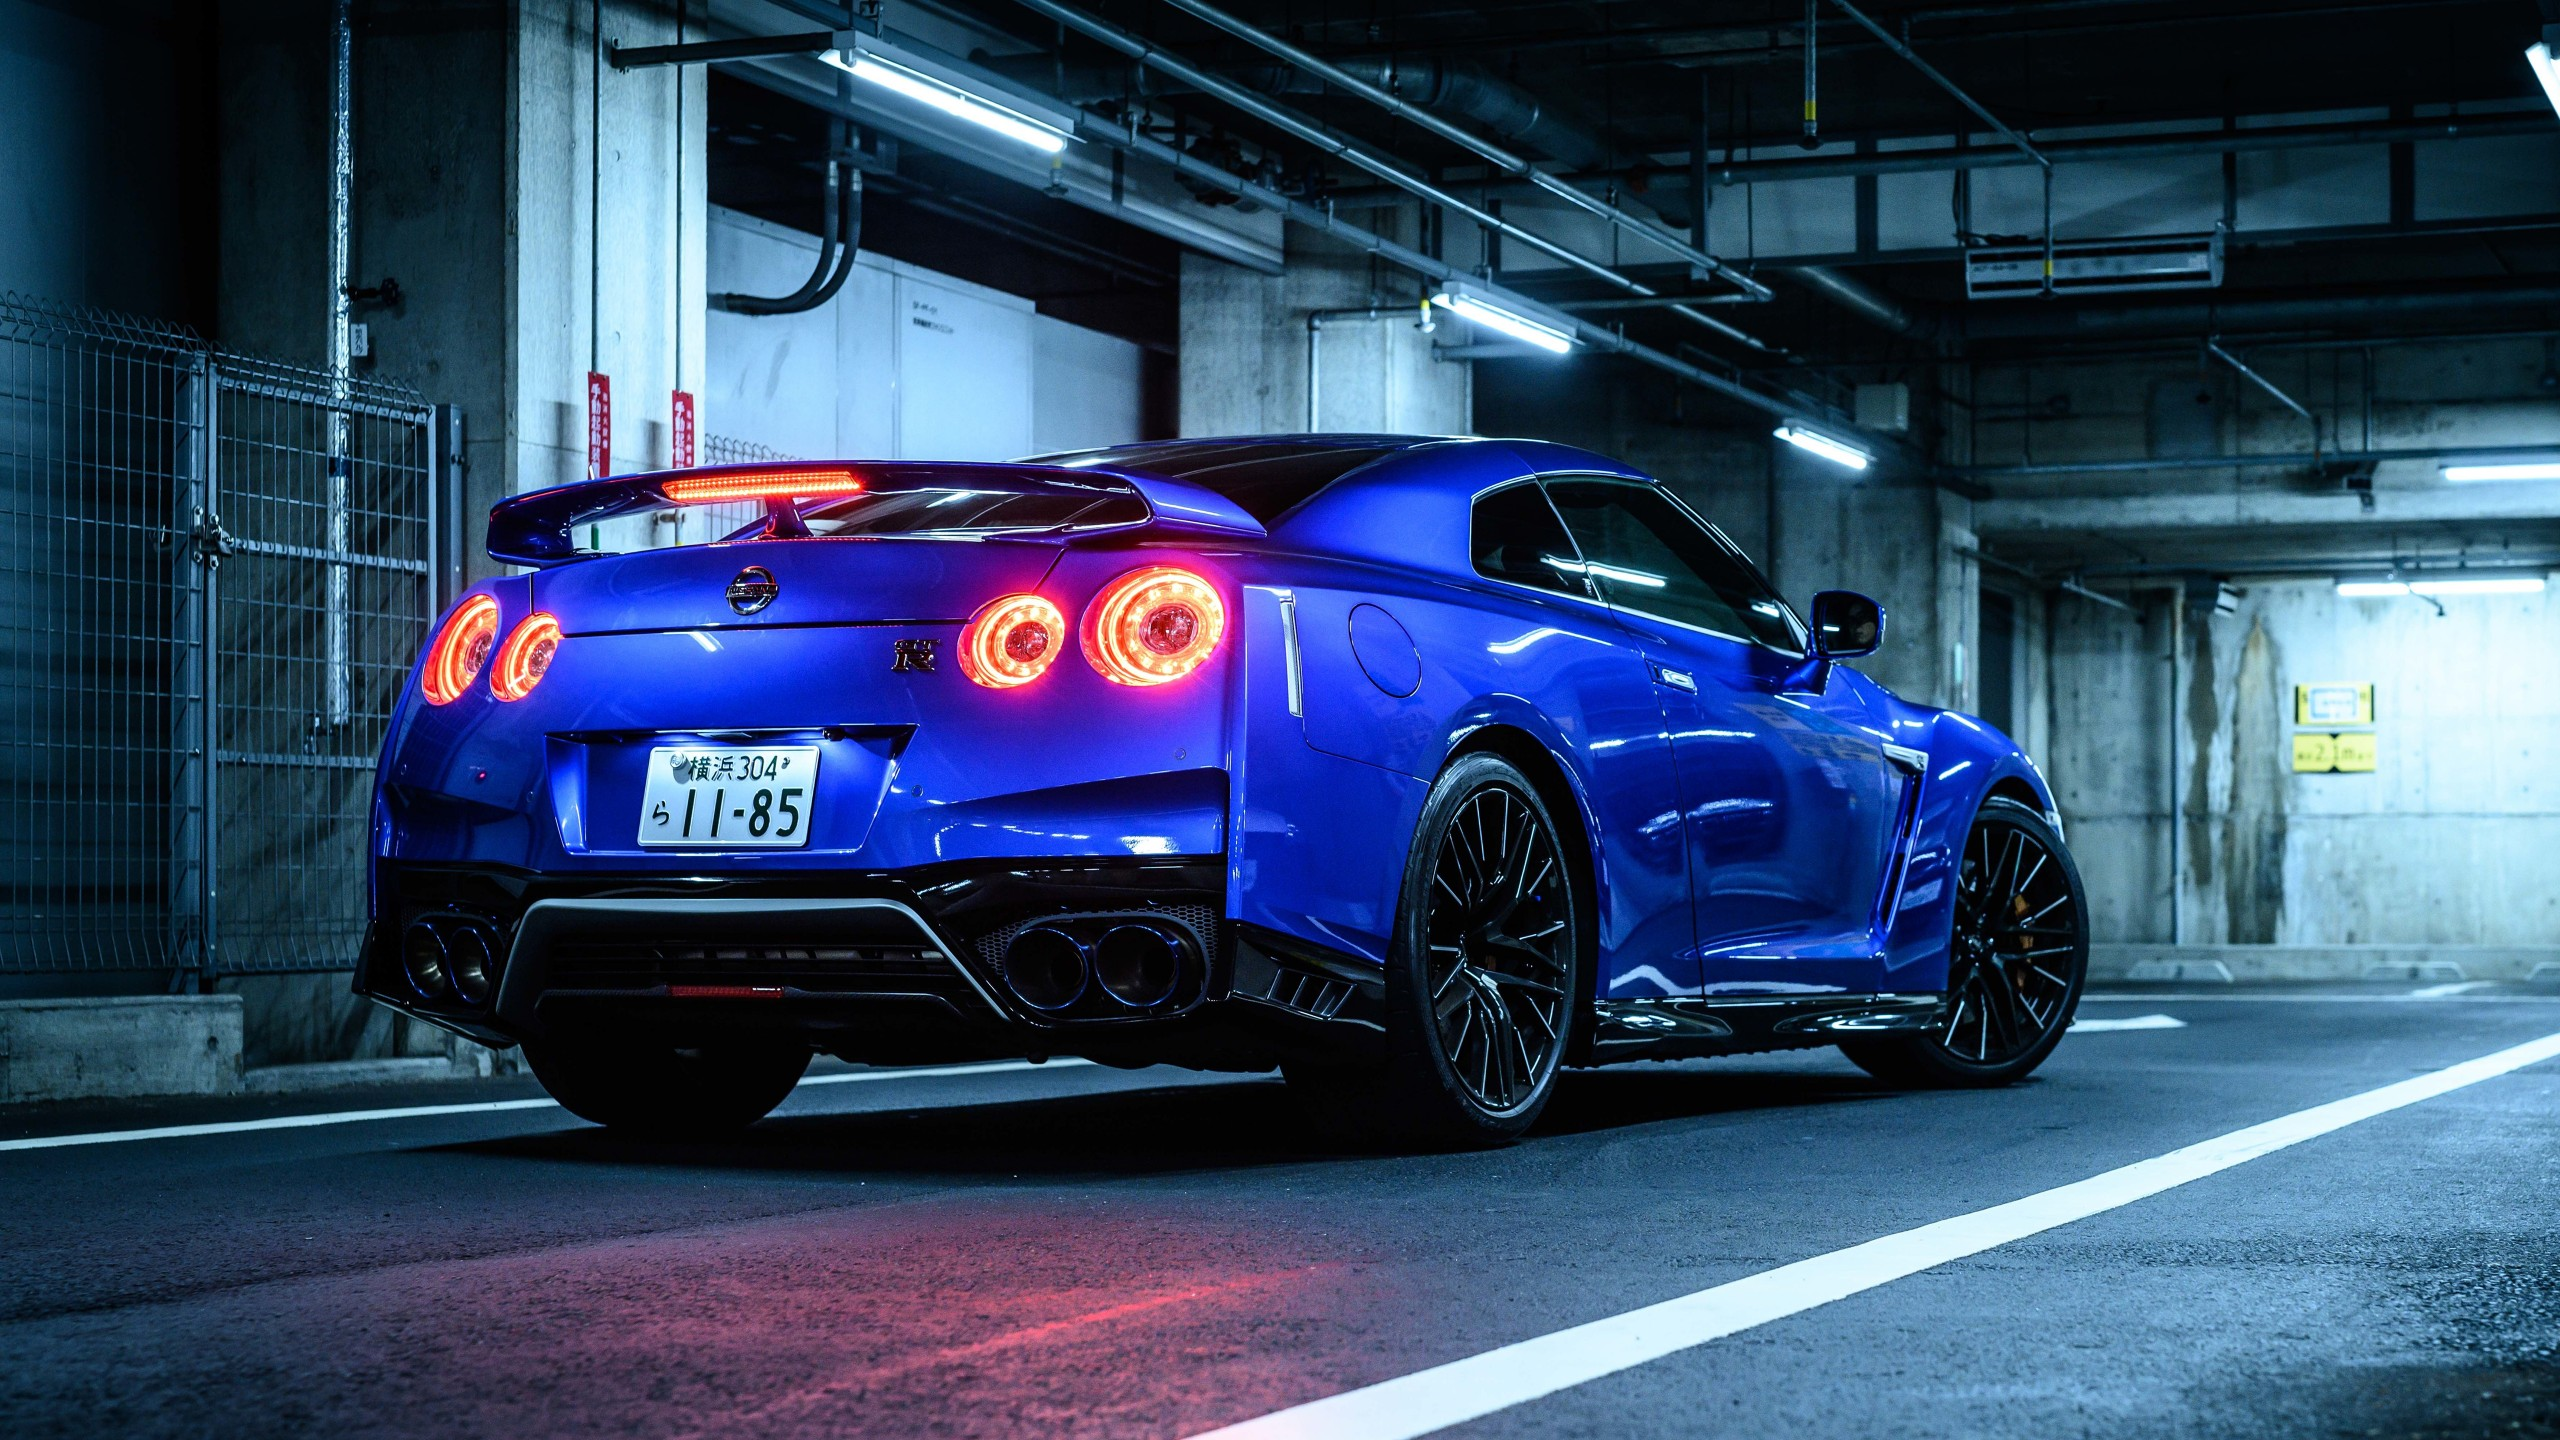 Nissan Gtr Interior >> Nissan GT-R 50th Anniversary 2019 4K 2 Wallpaper | HD Car Wallpapers | ID #13318